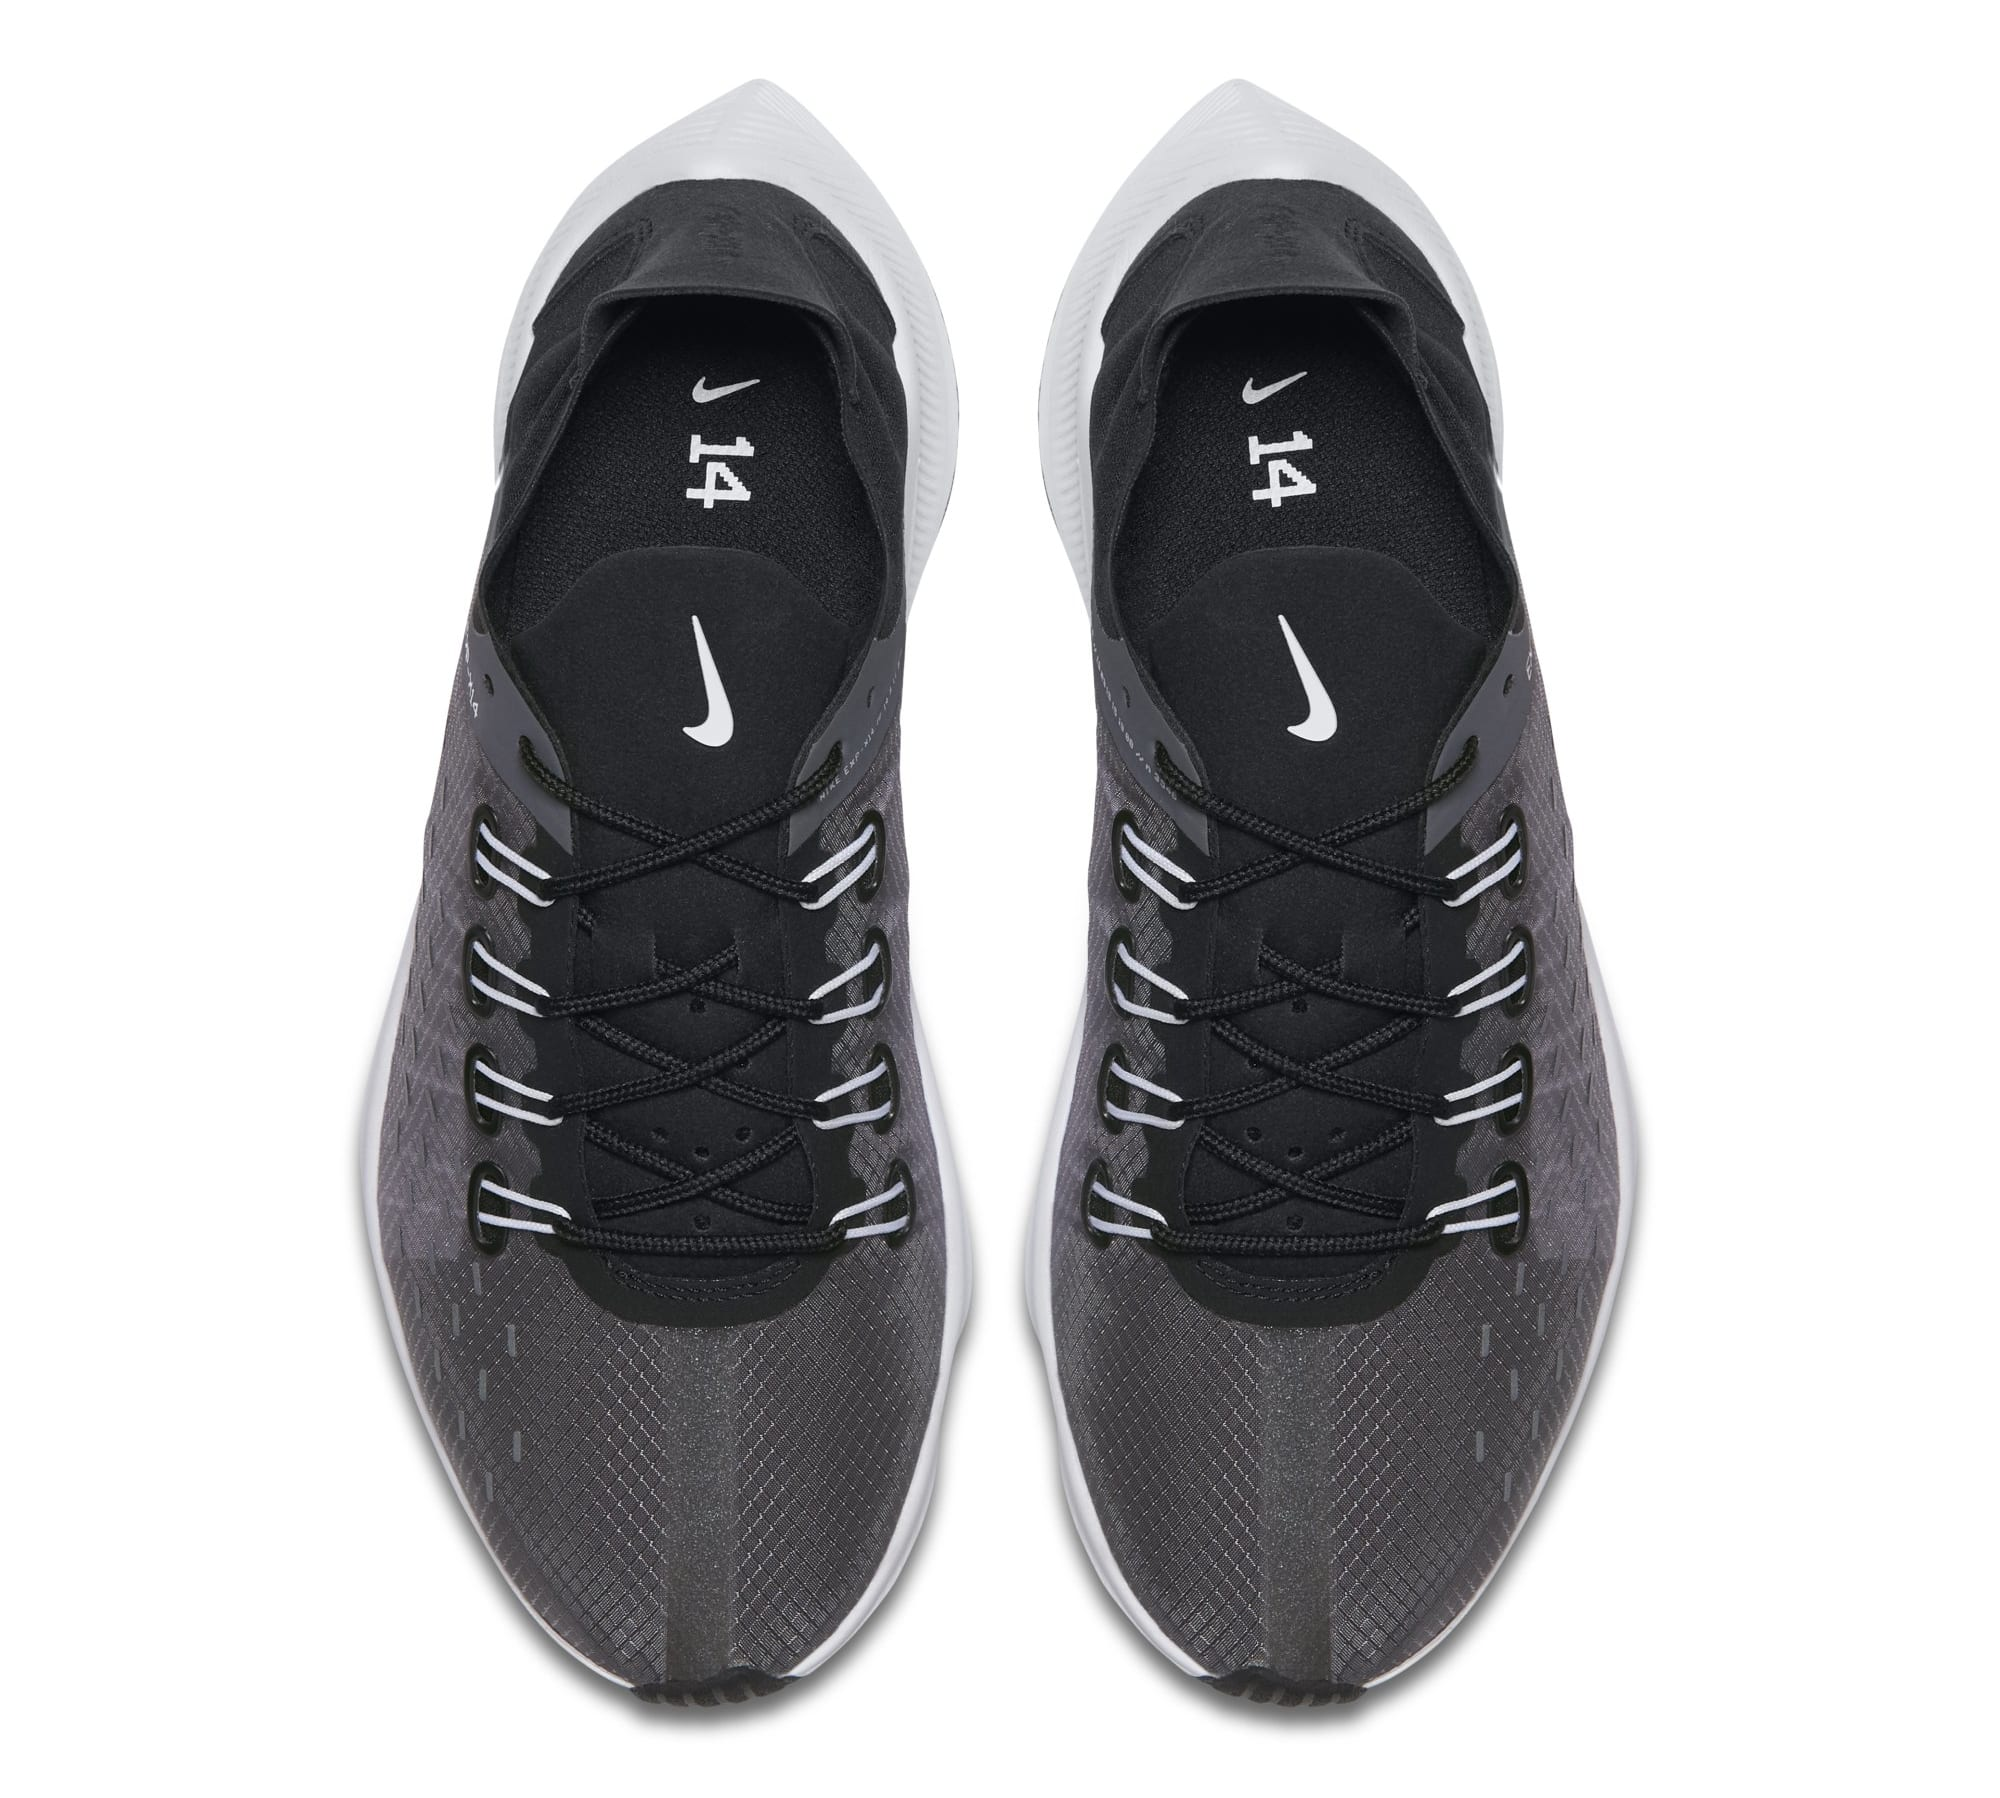 Nike WMNS EXP-X14 'Black/White/Wolf Grey' AO3170-001 (Top)